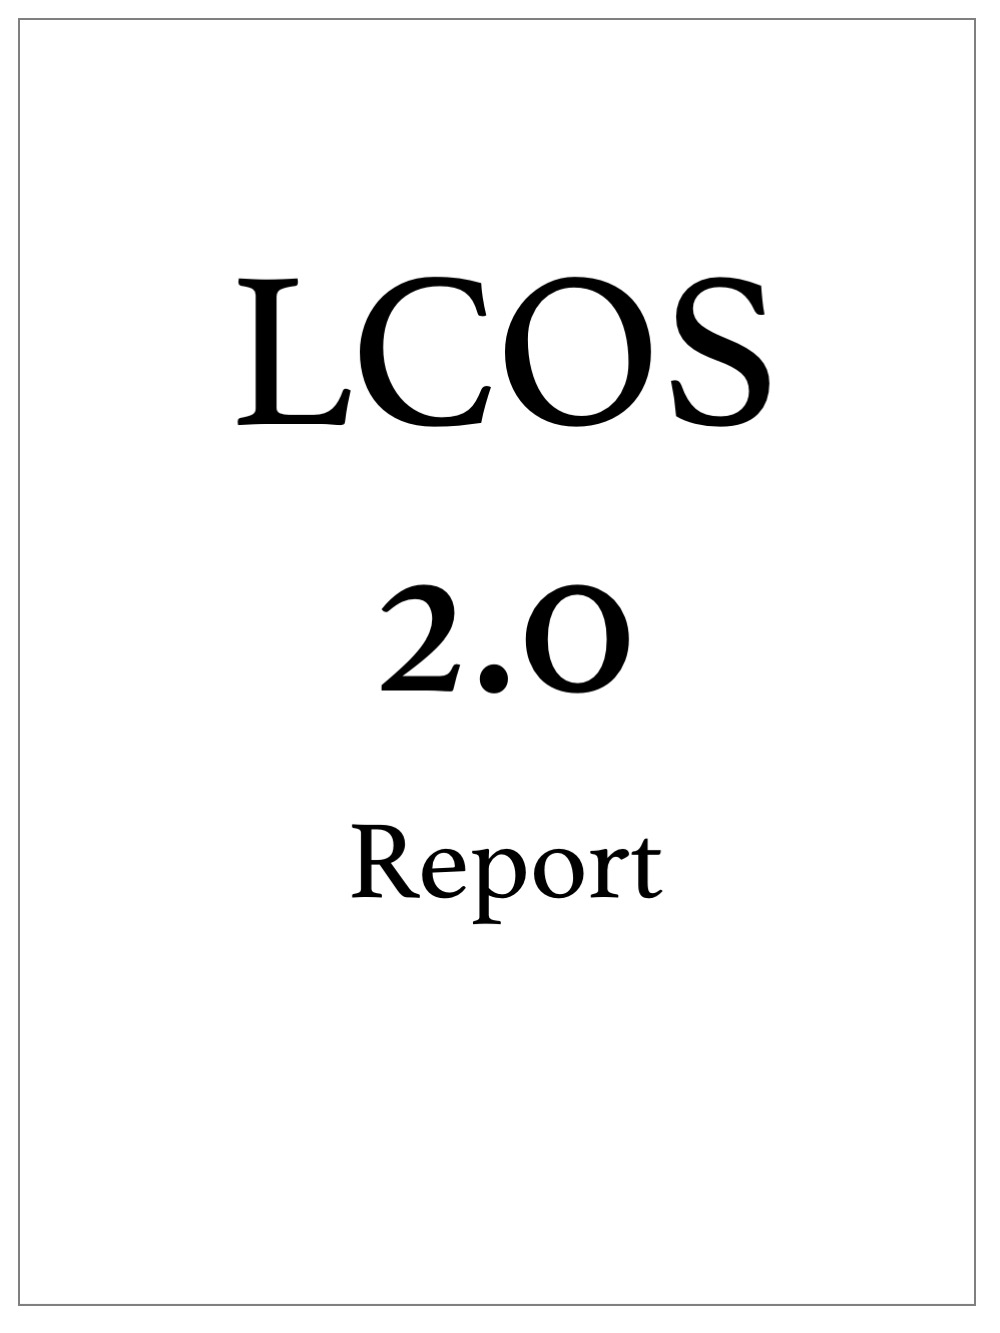 LCOS 2.0 logo report.jpg